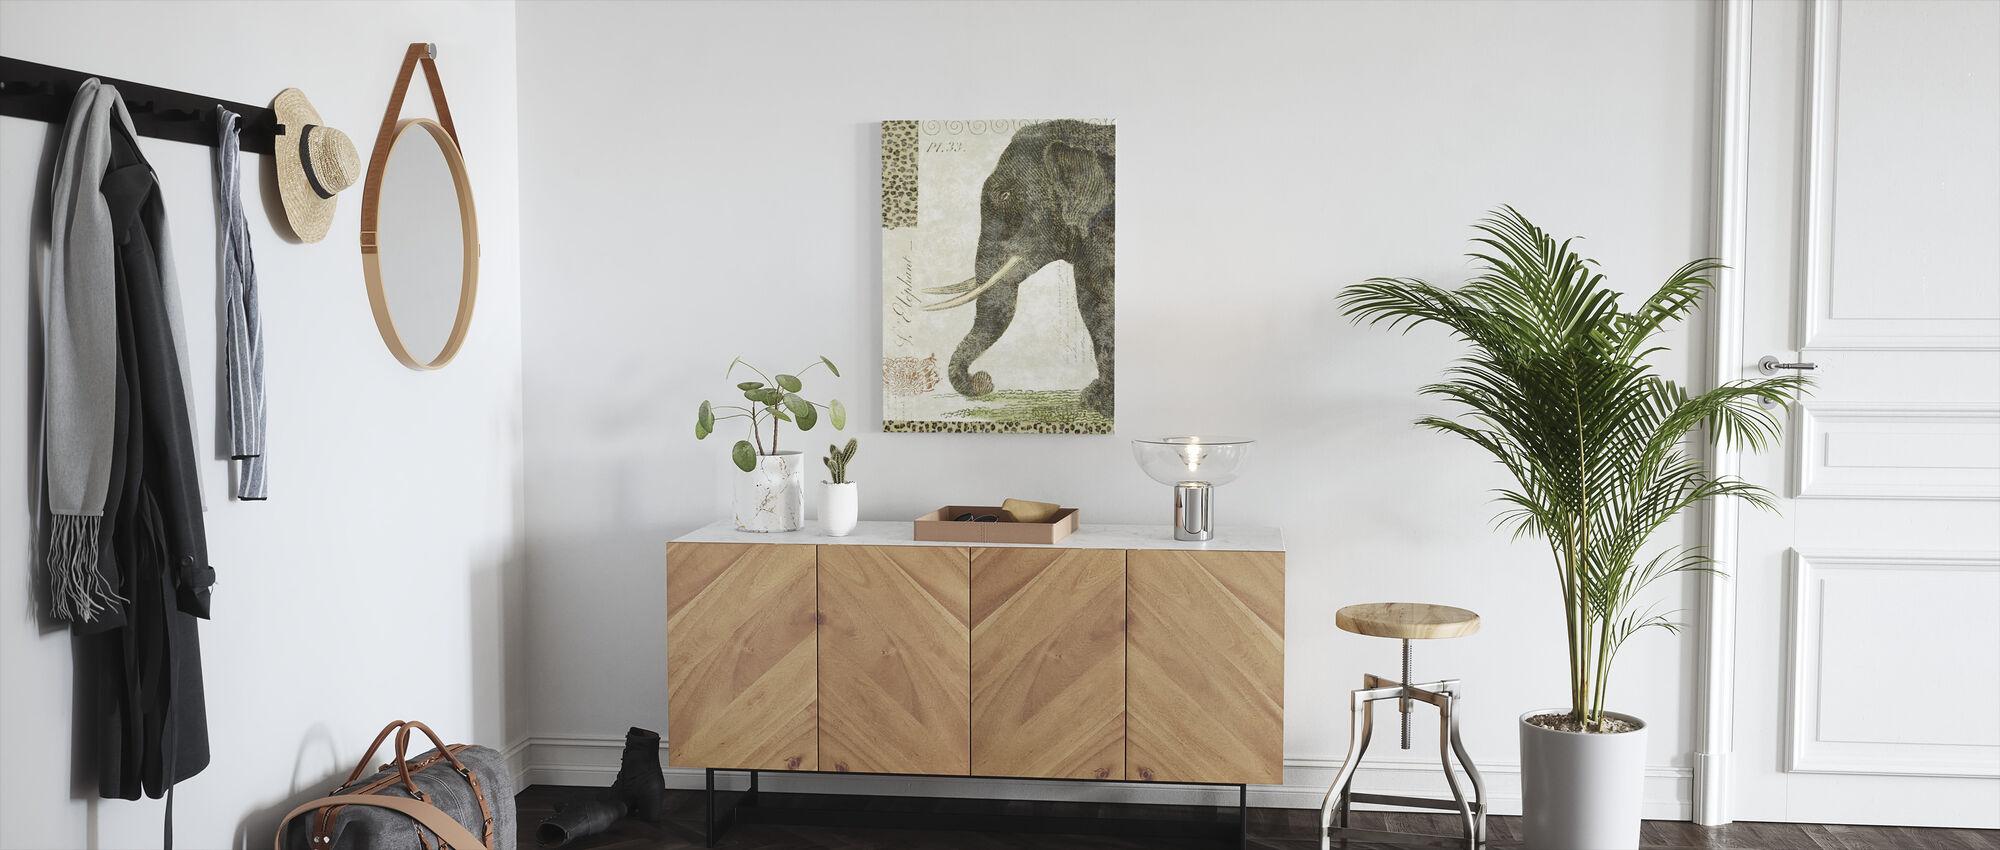 L Elefant - Canvastavla - Hall